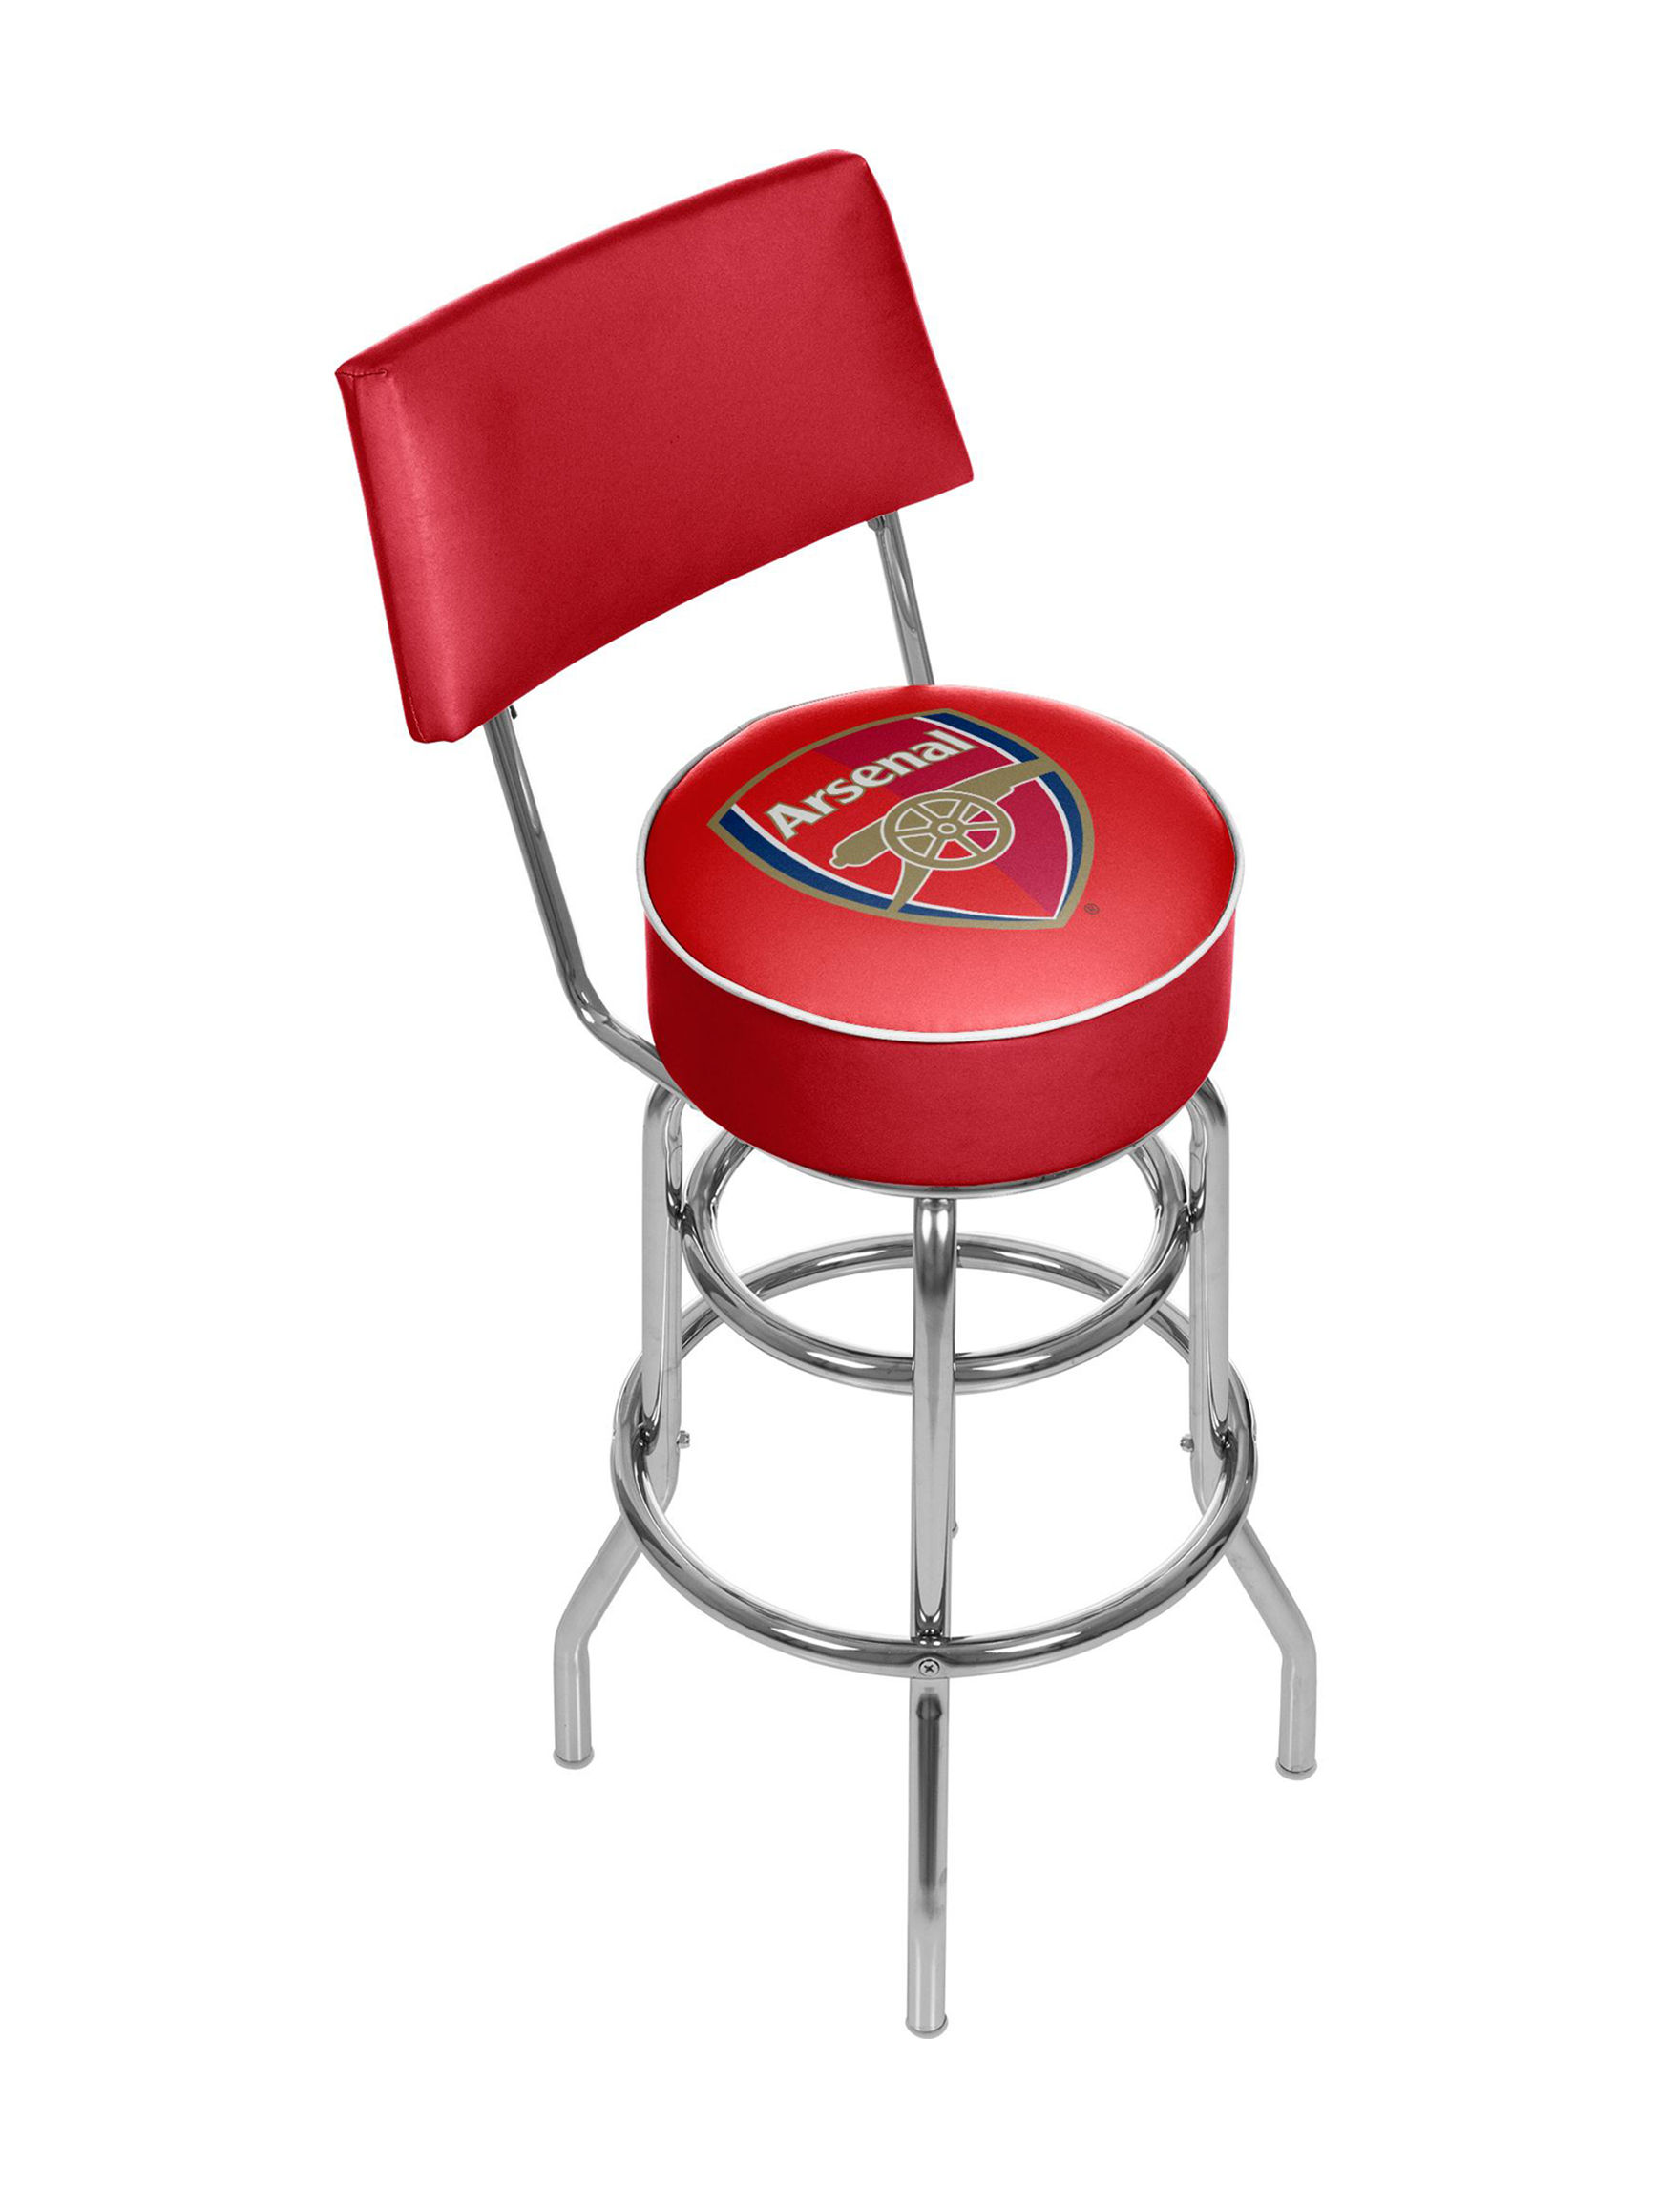 Trademark Global Red / Gold Bar & Kitchen Stools Kitchen & Dining Furniture